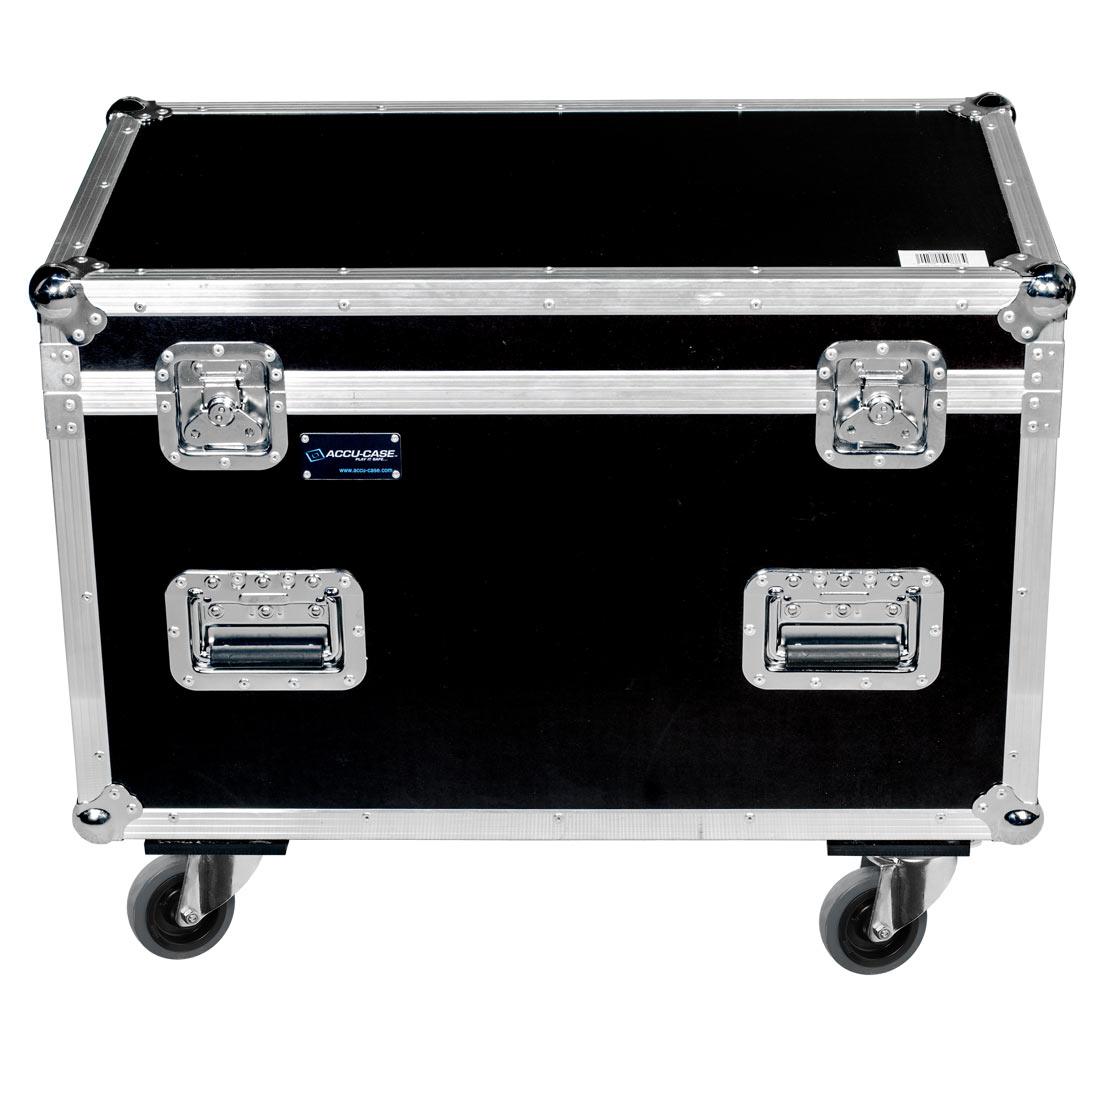 ADJ Touring Case 4x Inno Spot Pro